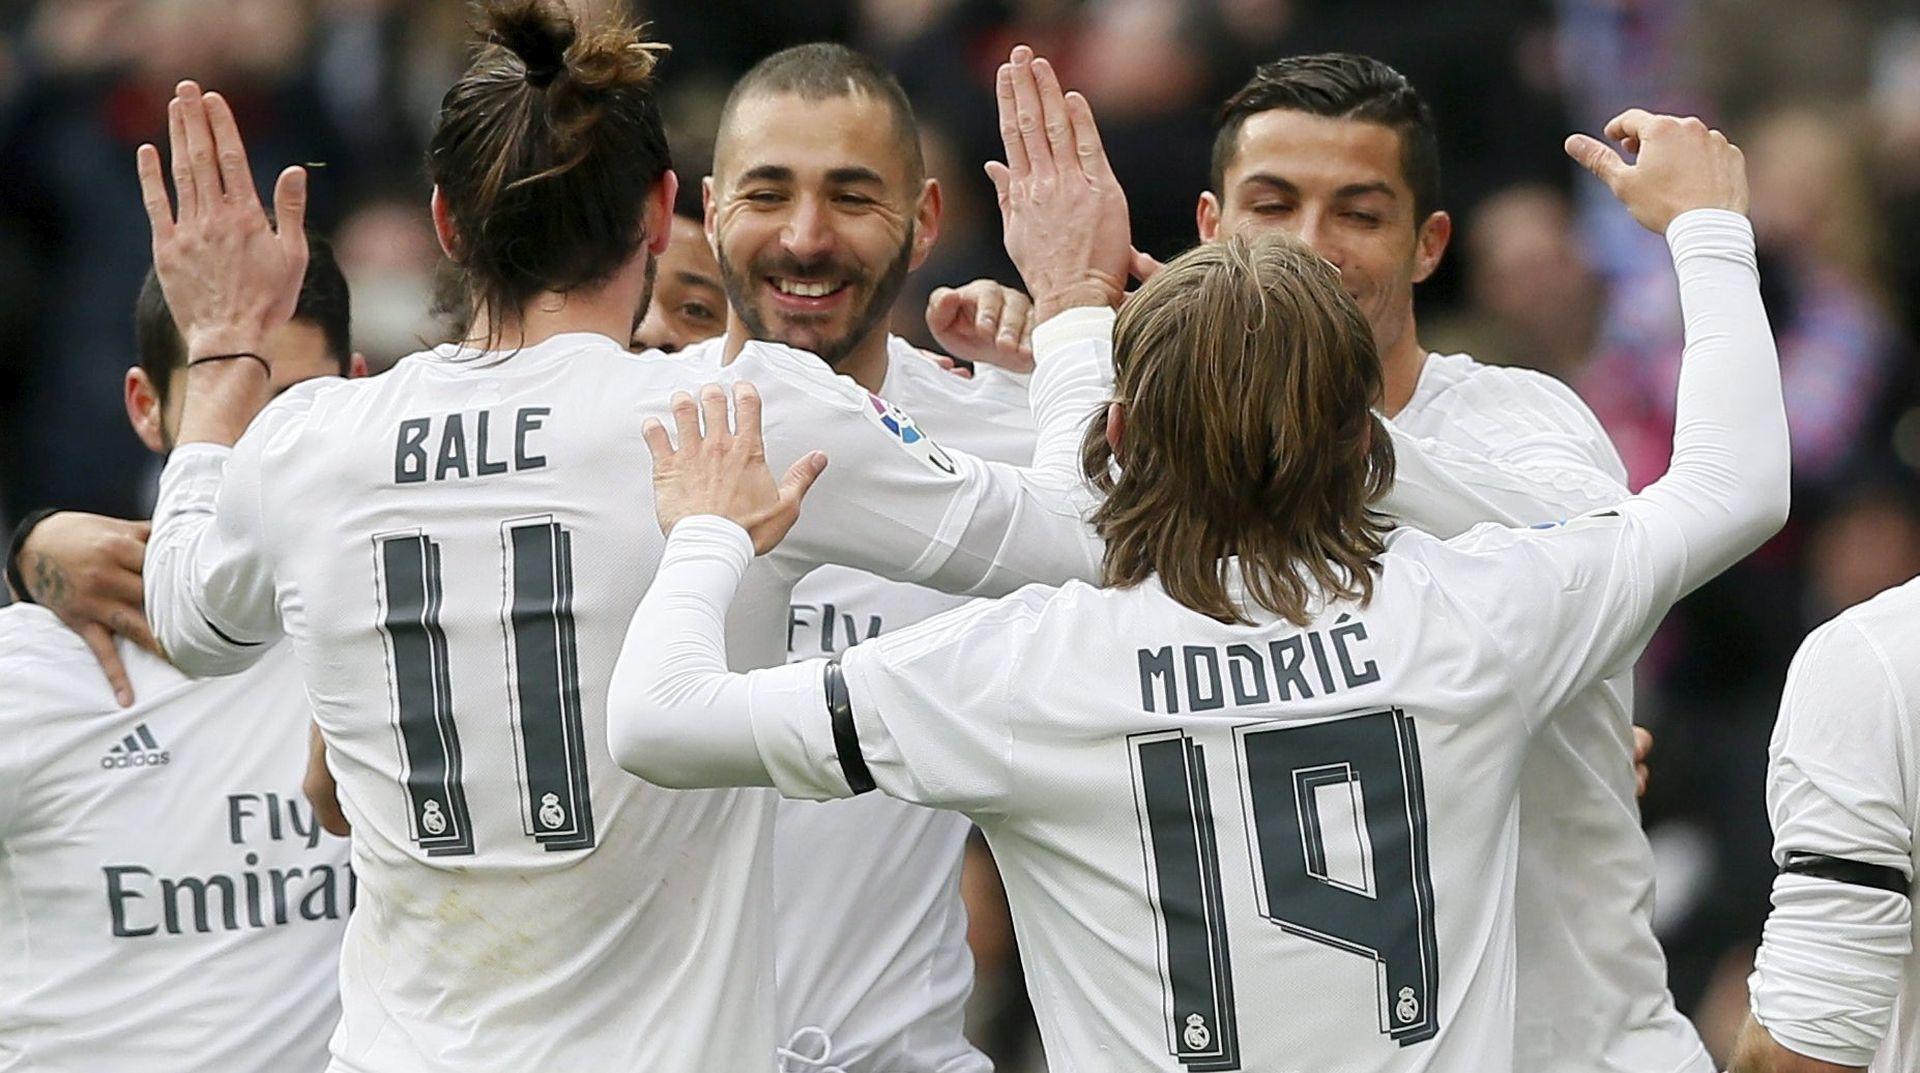 DELOITTE Real Madrid najbogatiji klub, Bilićev West Ham među prvih 20